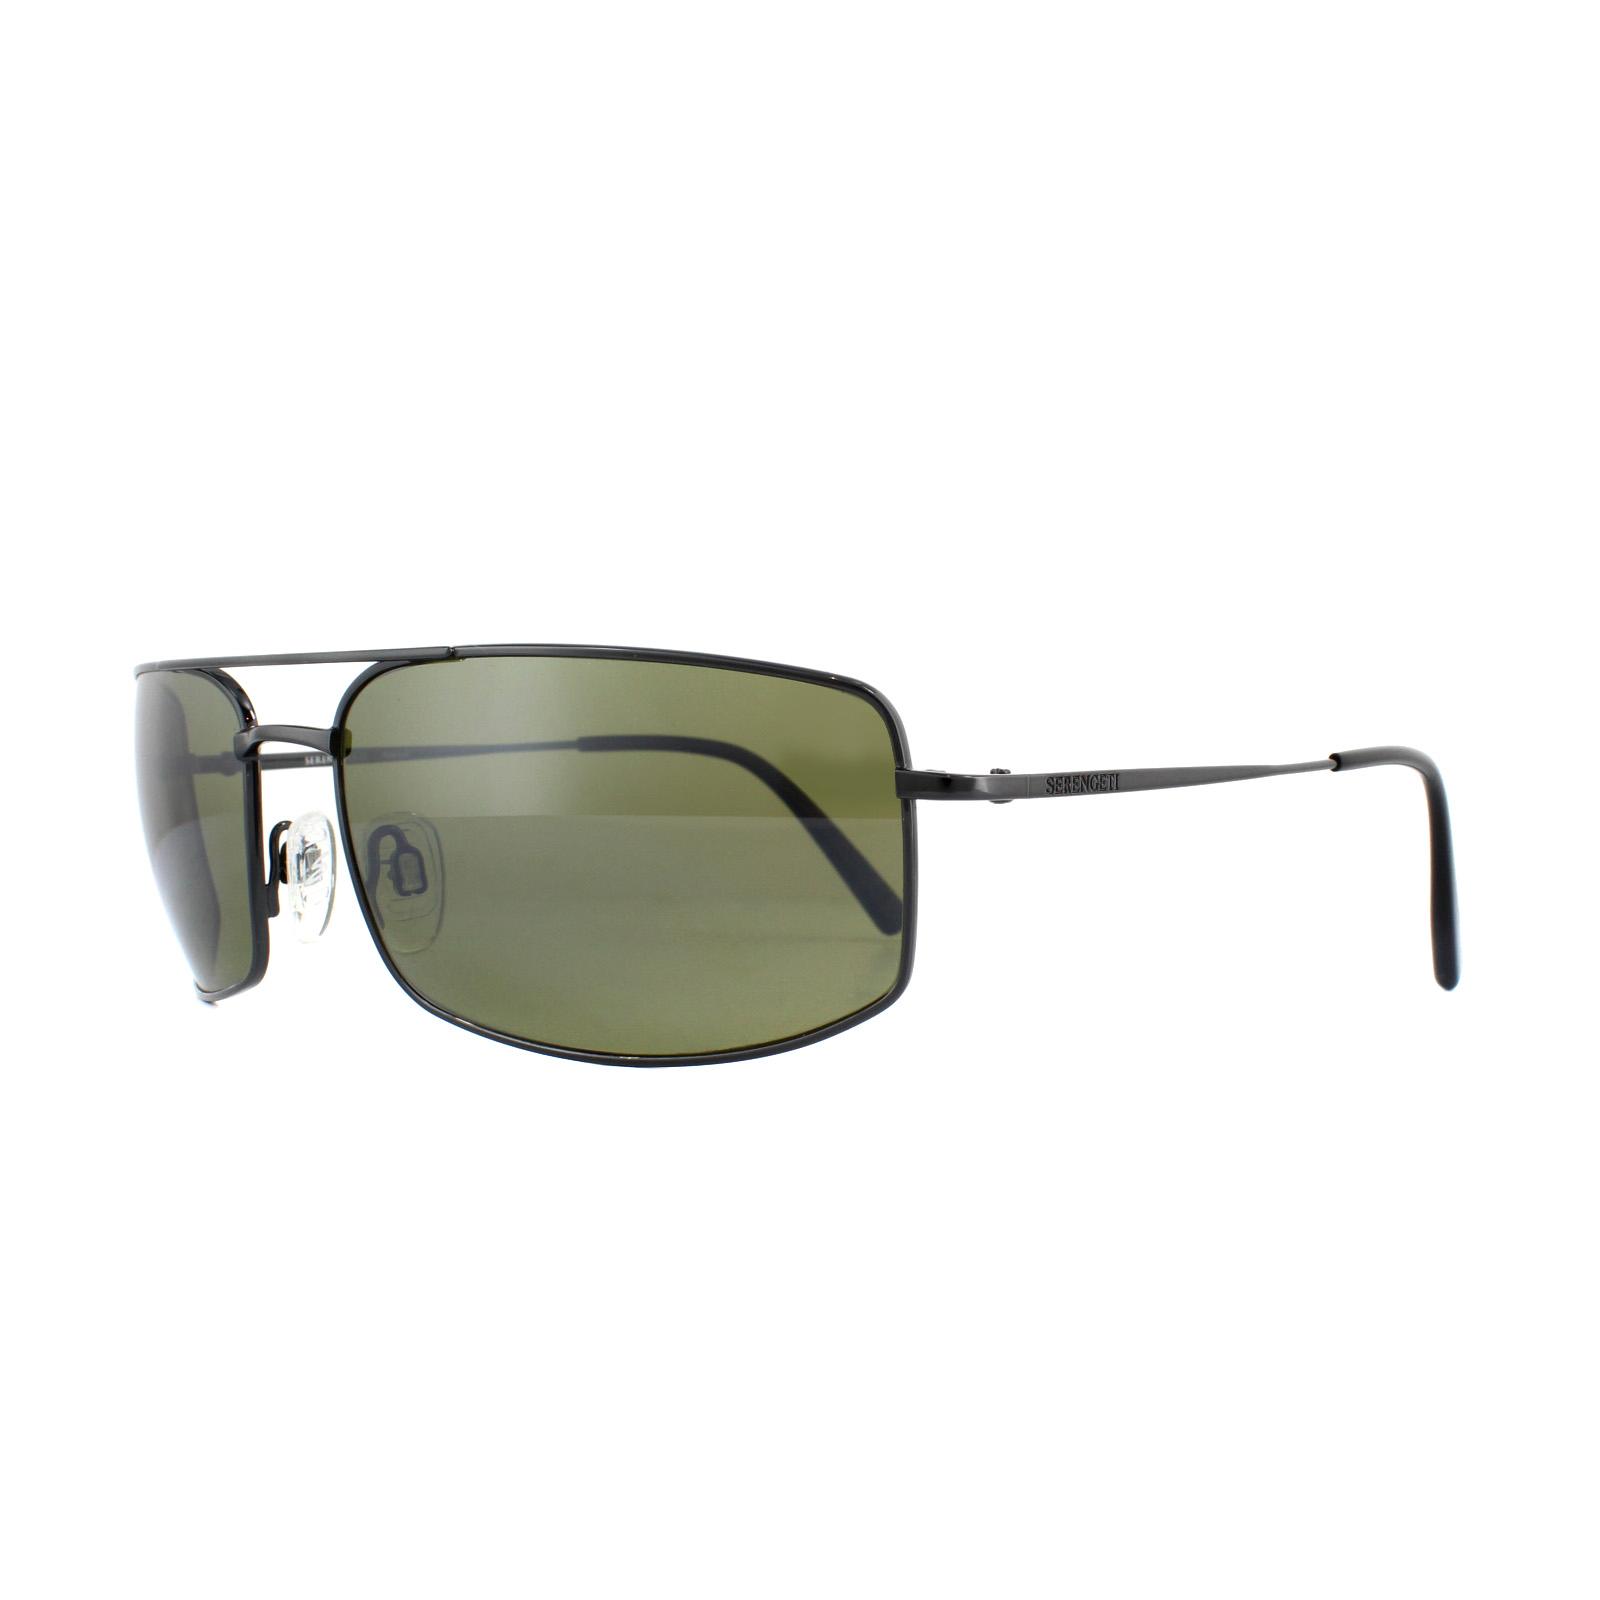 0be2e878ce7 Sentinel Serengeti Sunglasses Treviso 8303 Shiny Dark Gunmetal 555nm Green  Polarized